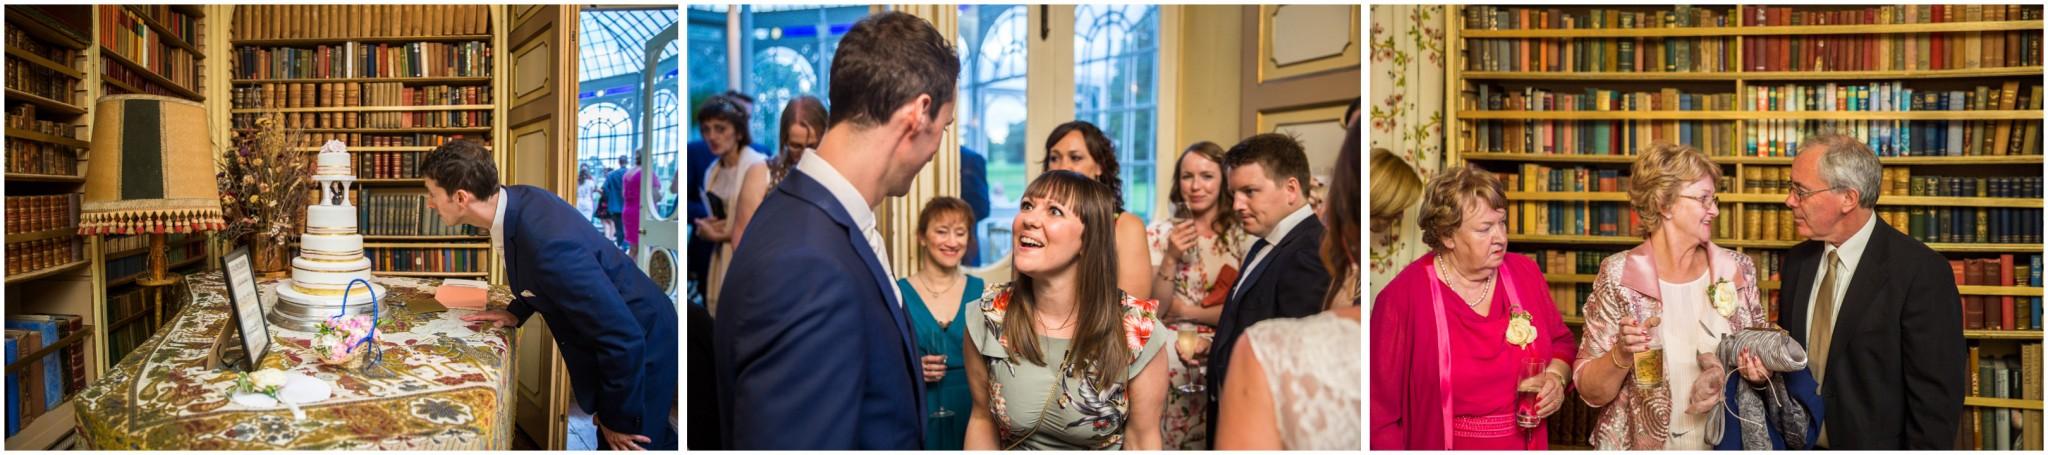 Avington Park Wedding Evening Reception Guests